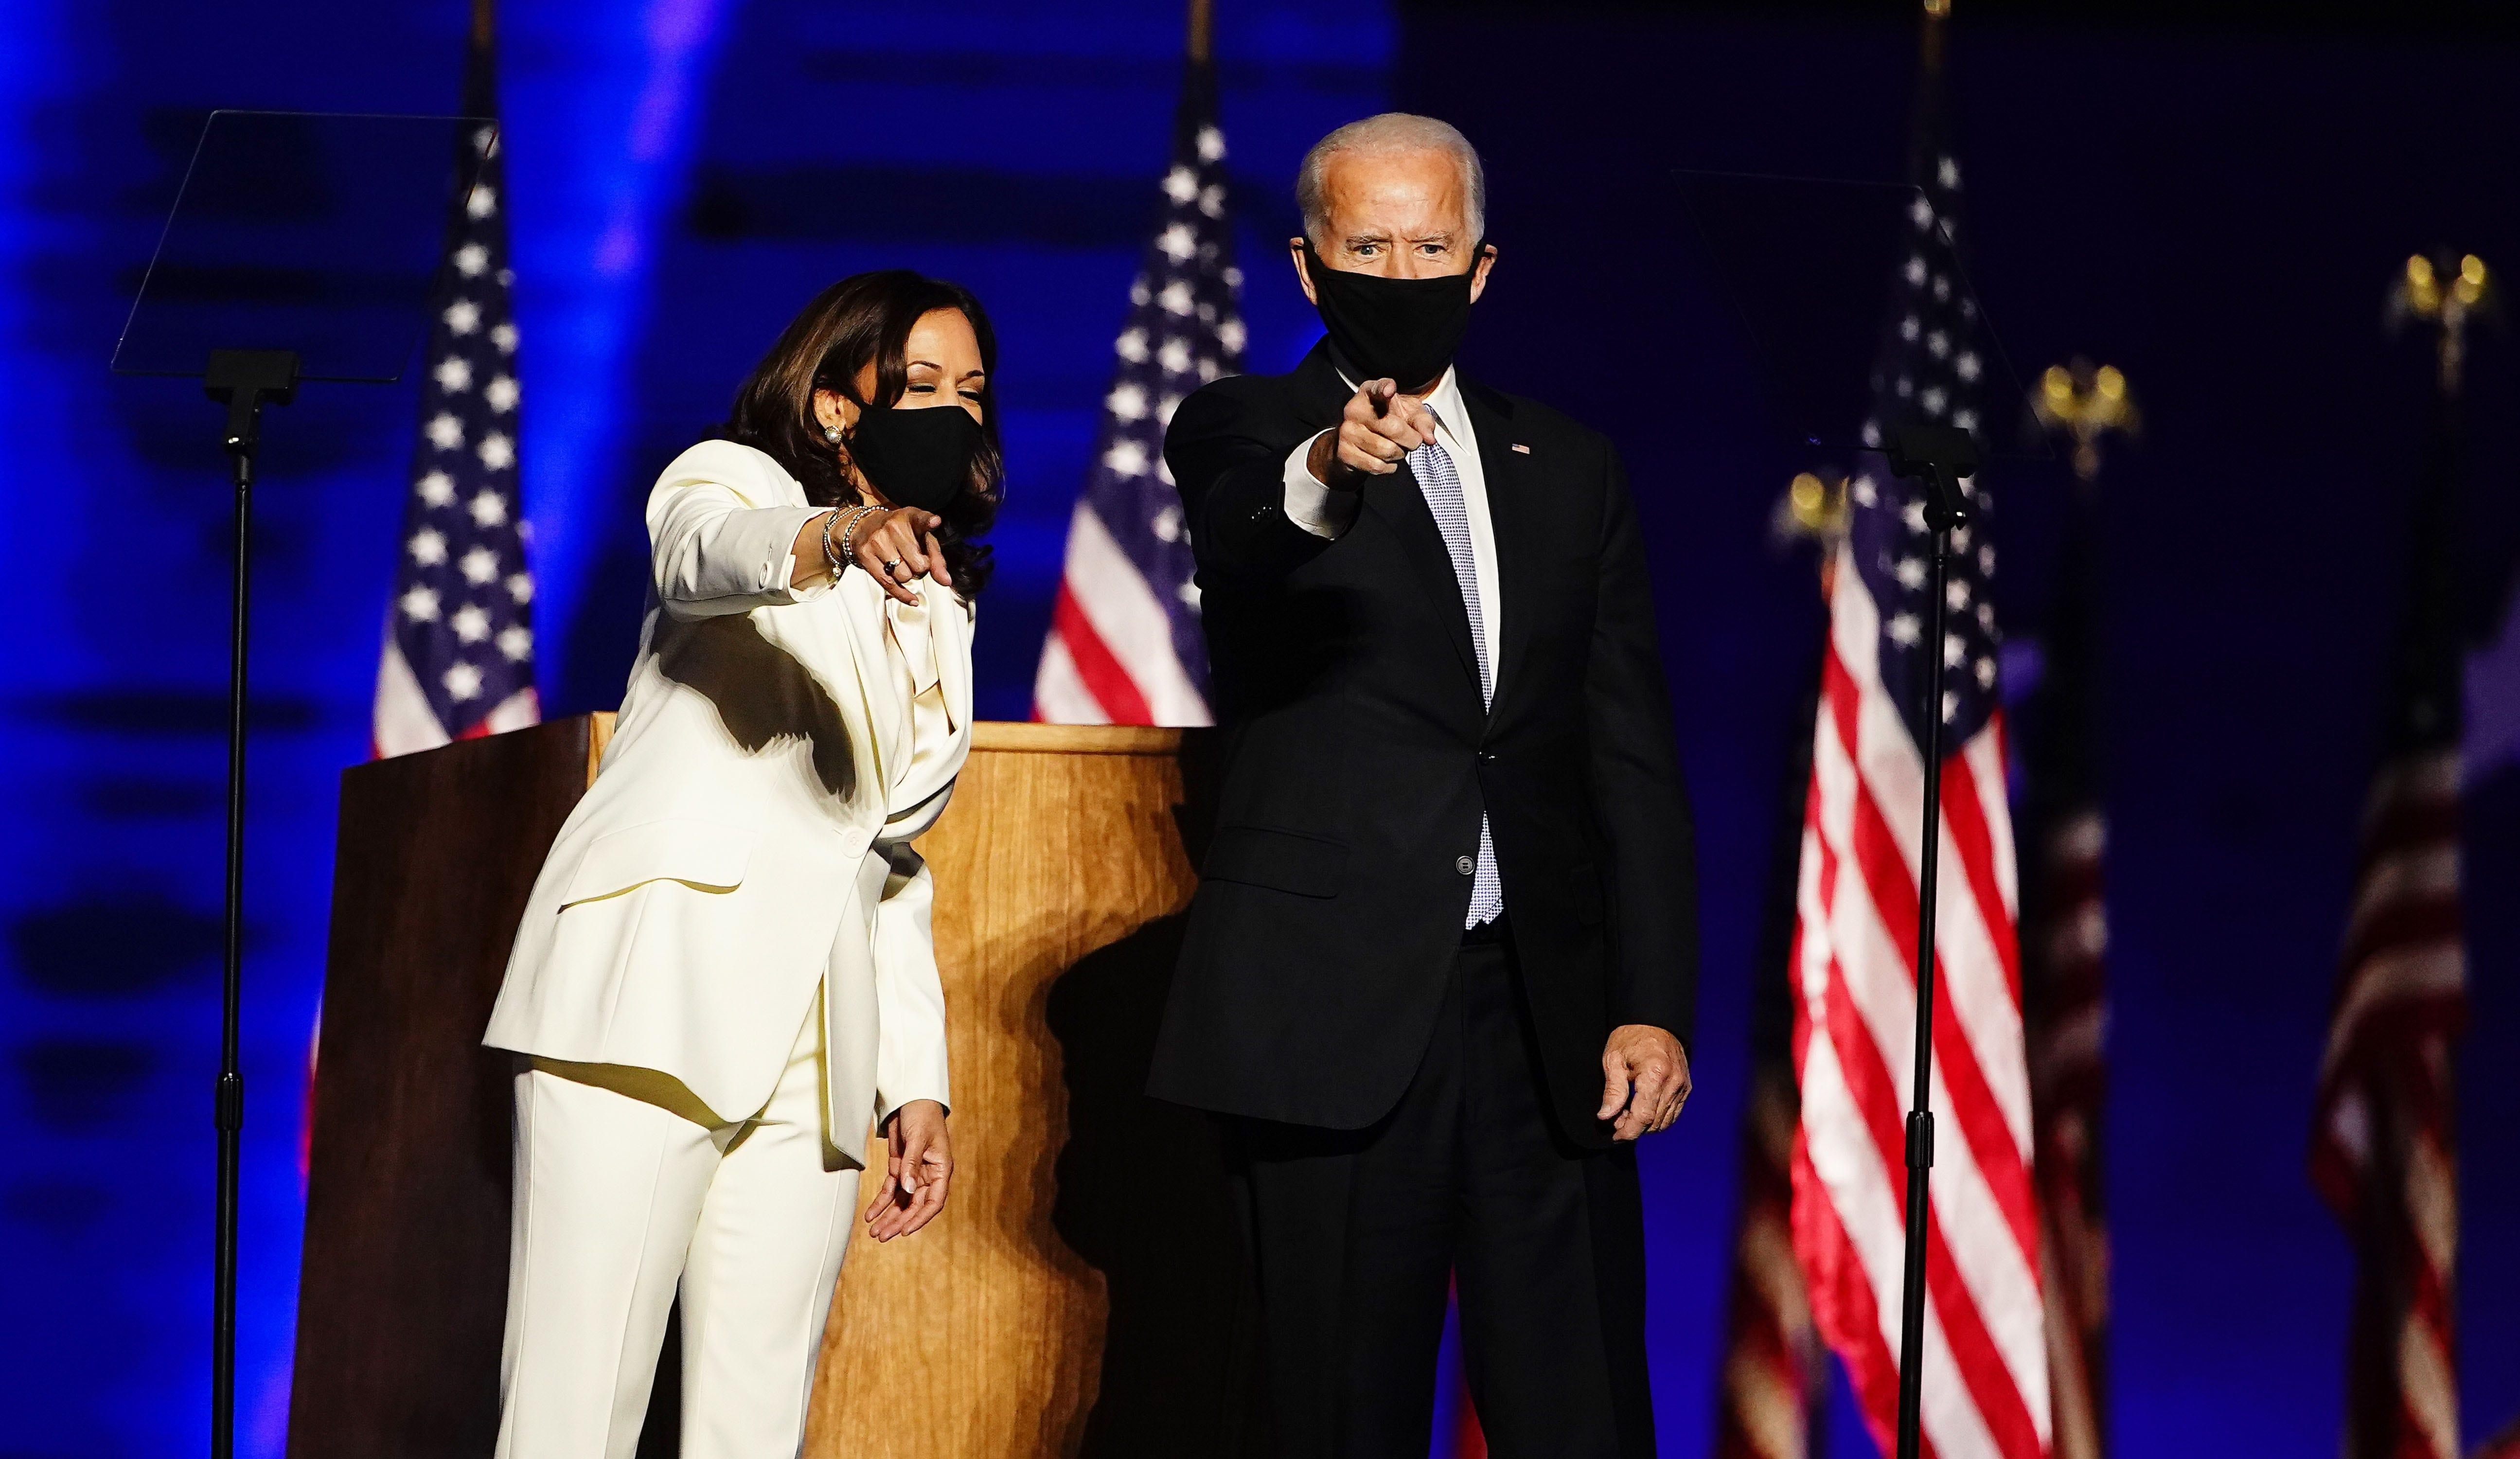 Time to heal in America : President-elect Joe Biden, VP-elect Kamala Harris talk of unity